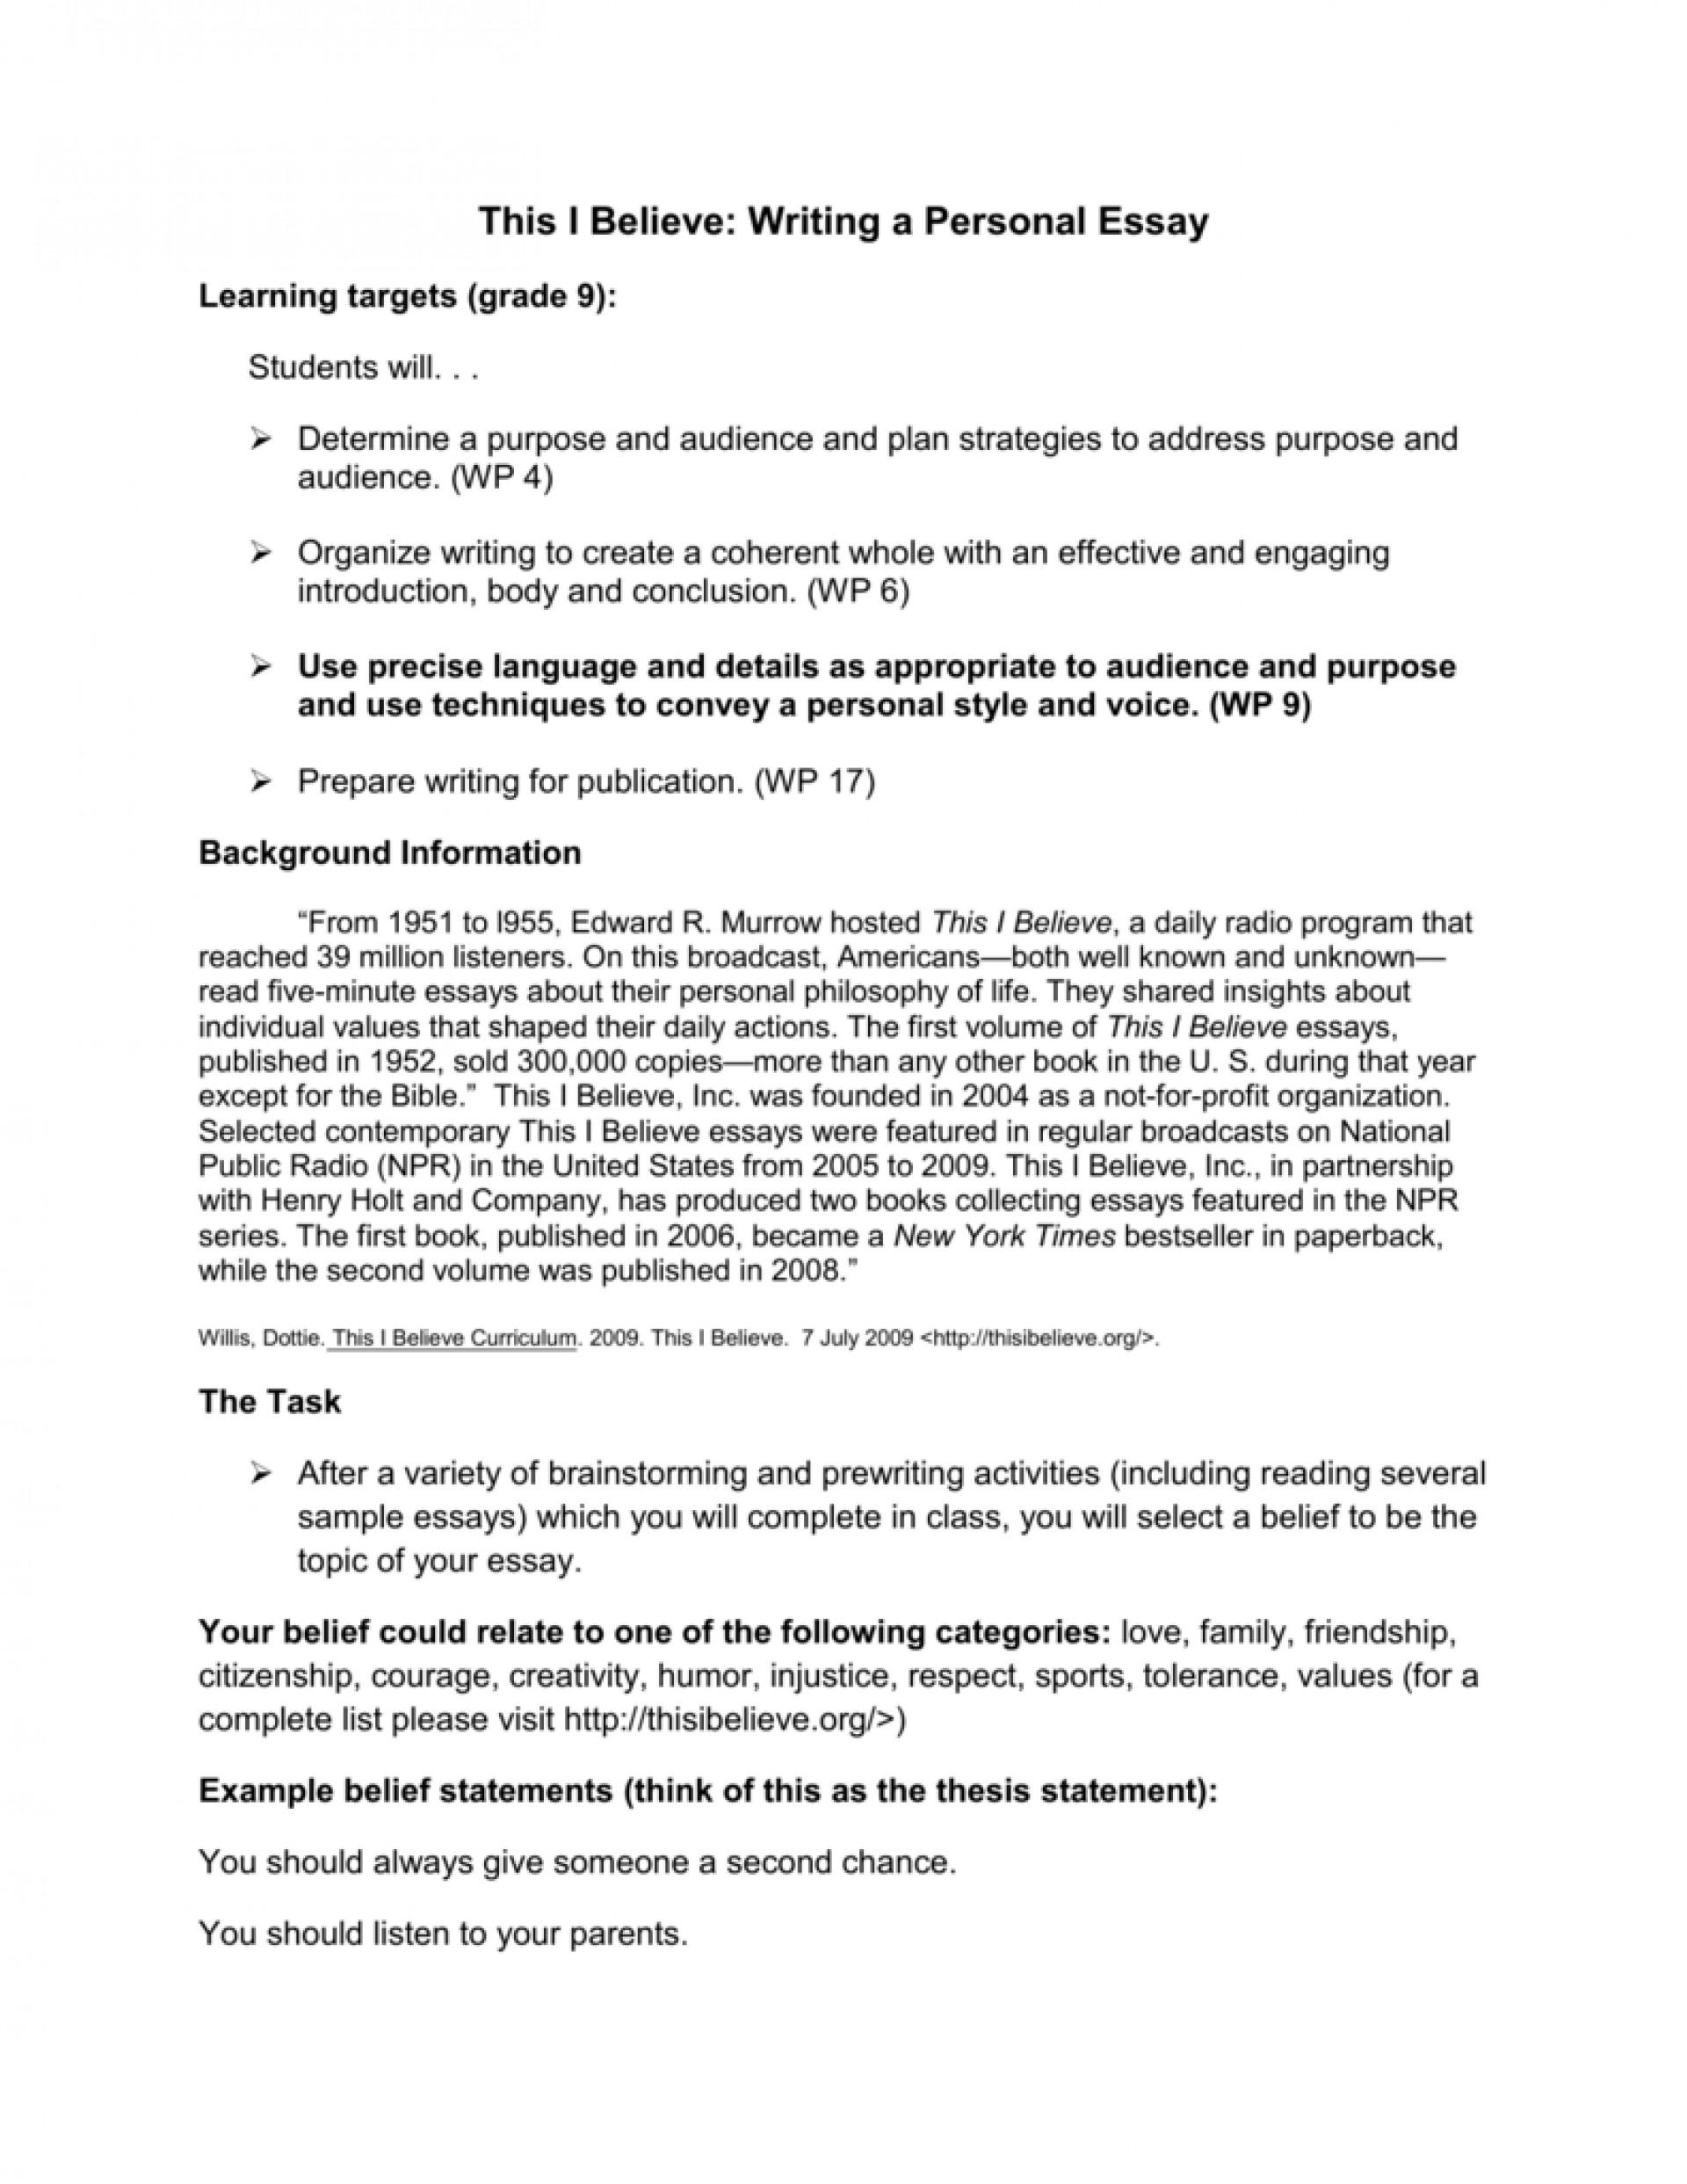 002 Essay Example 006750112 1 I Impressive Believe This Examples College Rubric Format 1920